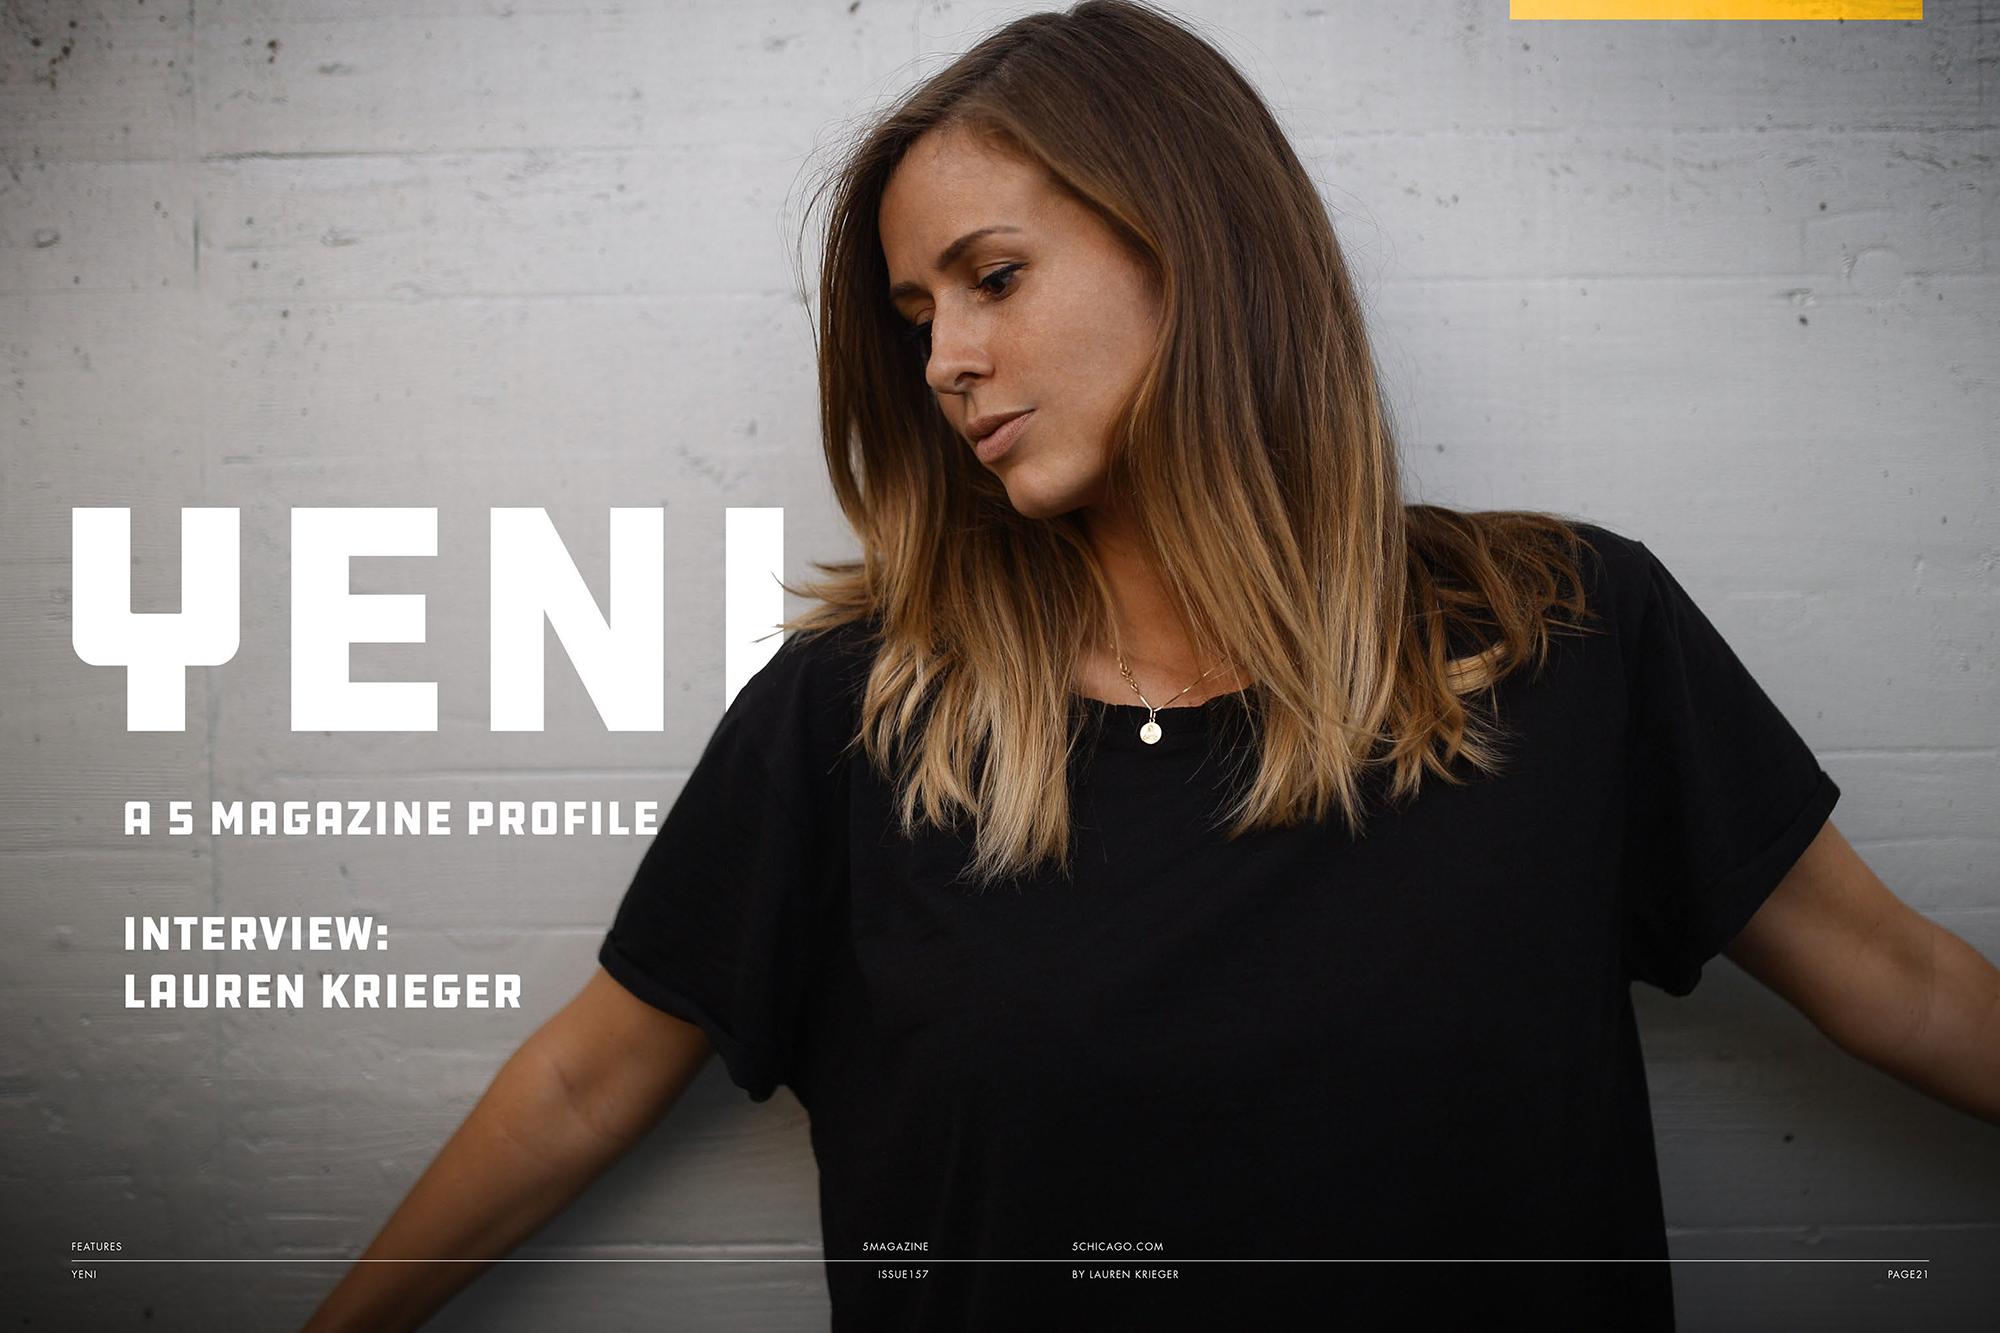 Yeni Magazine Interview